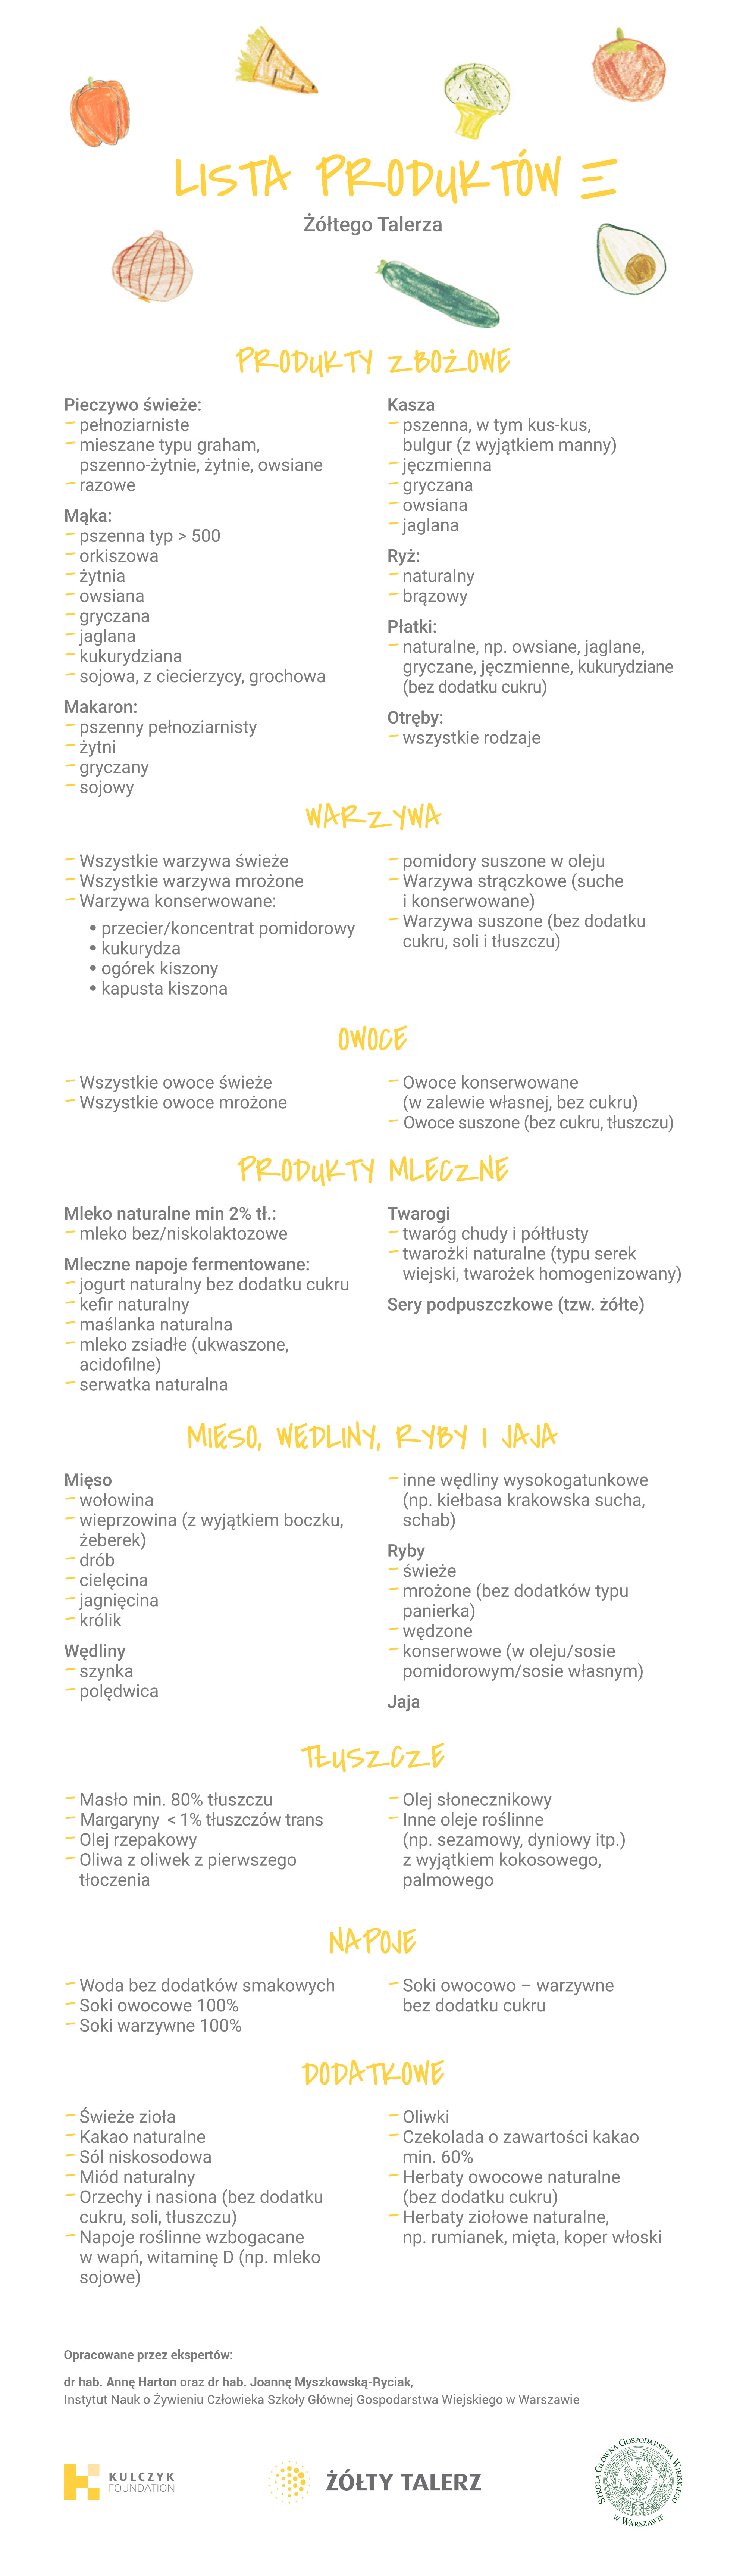 lista-produktow-zt